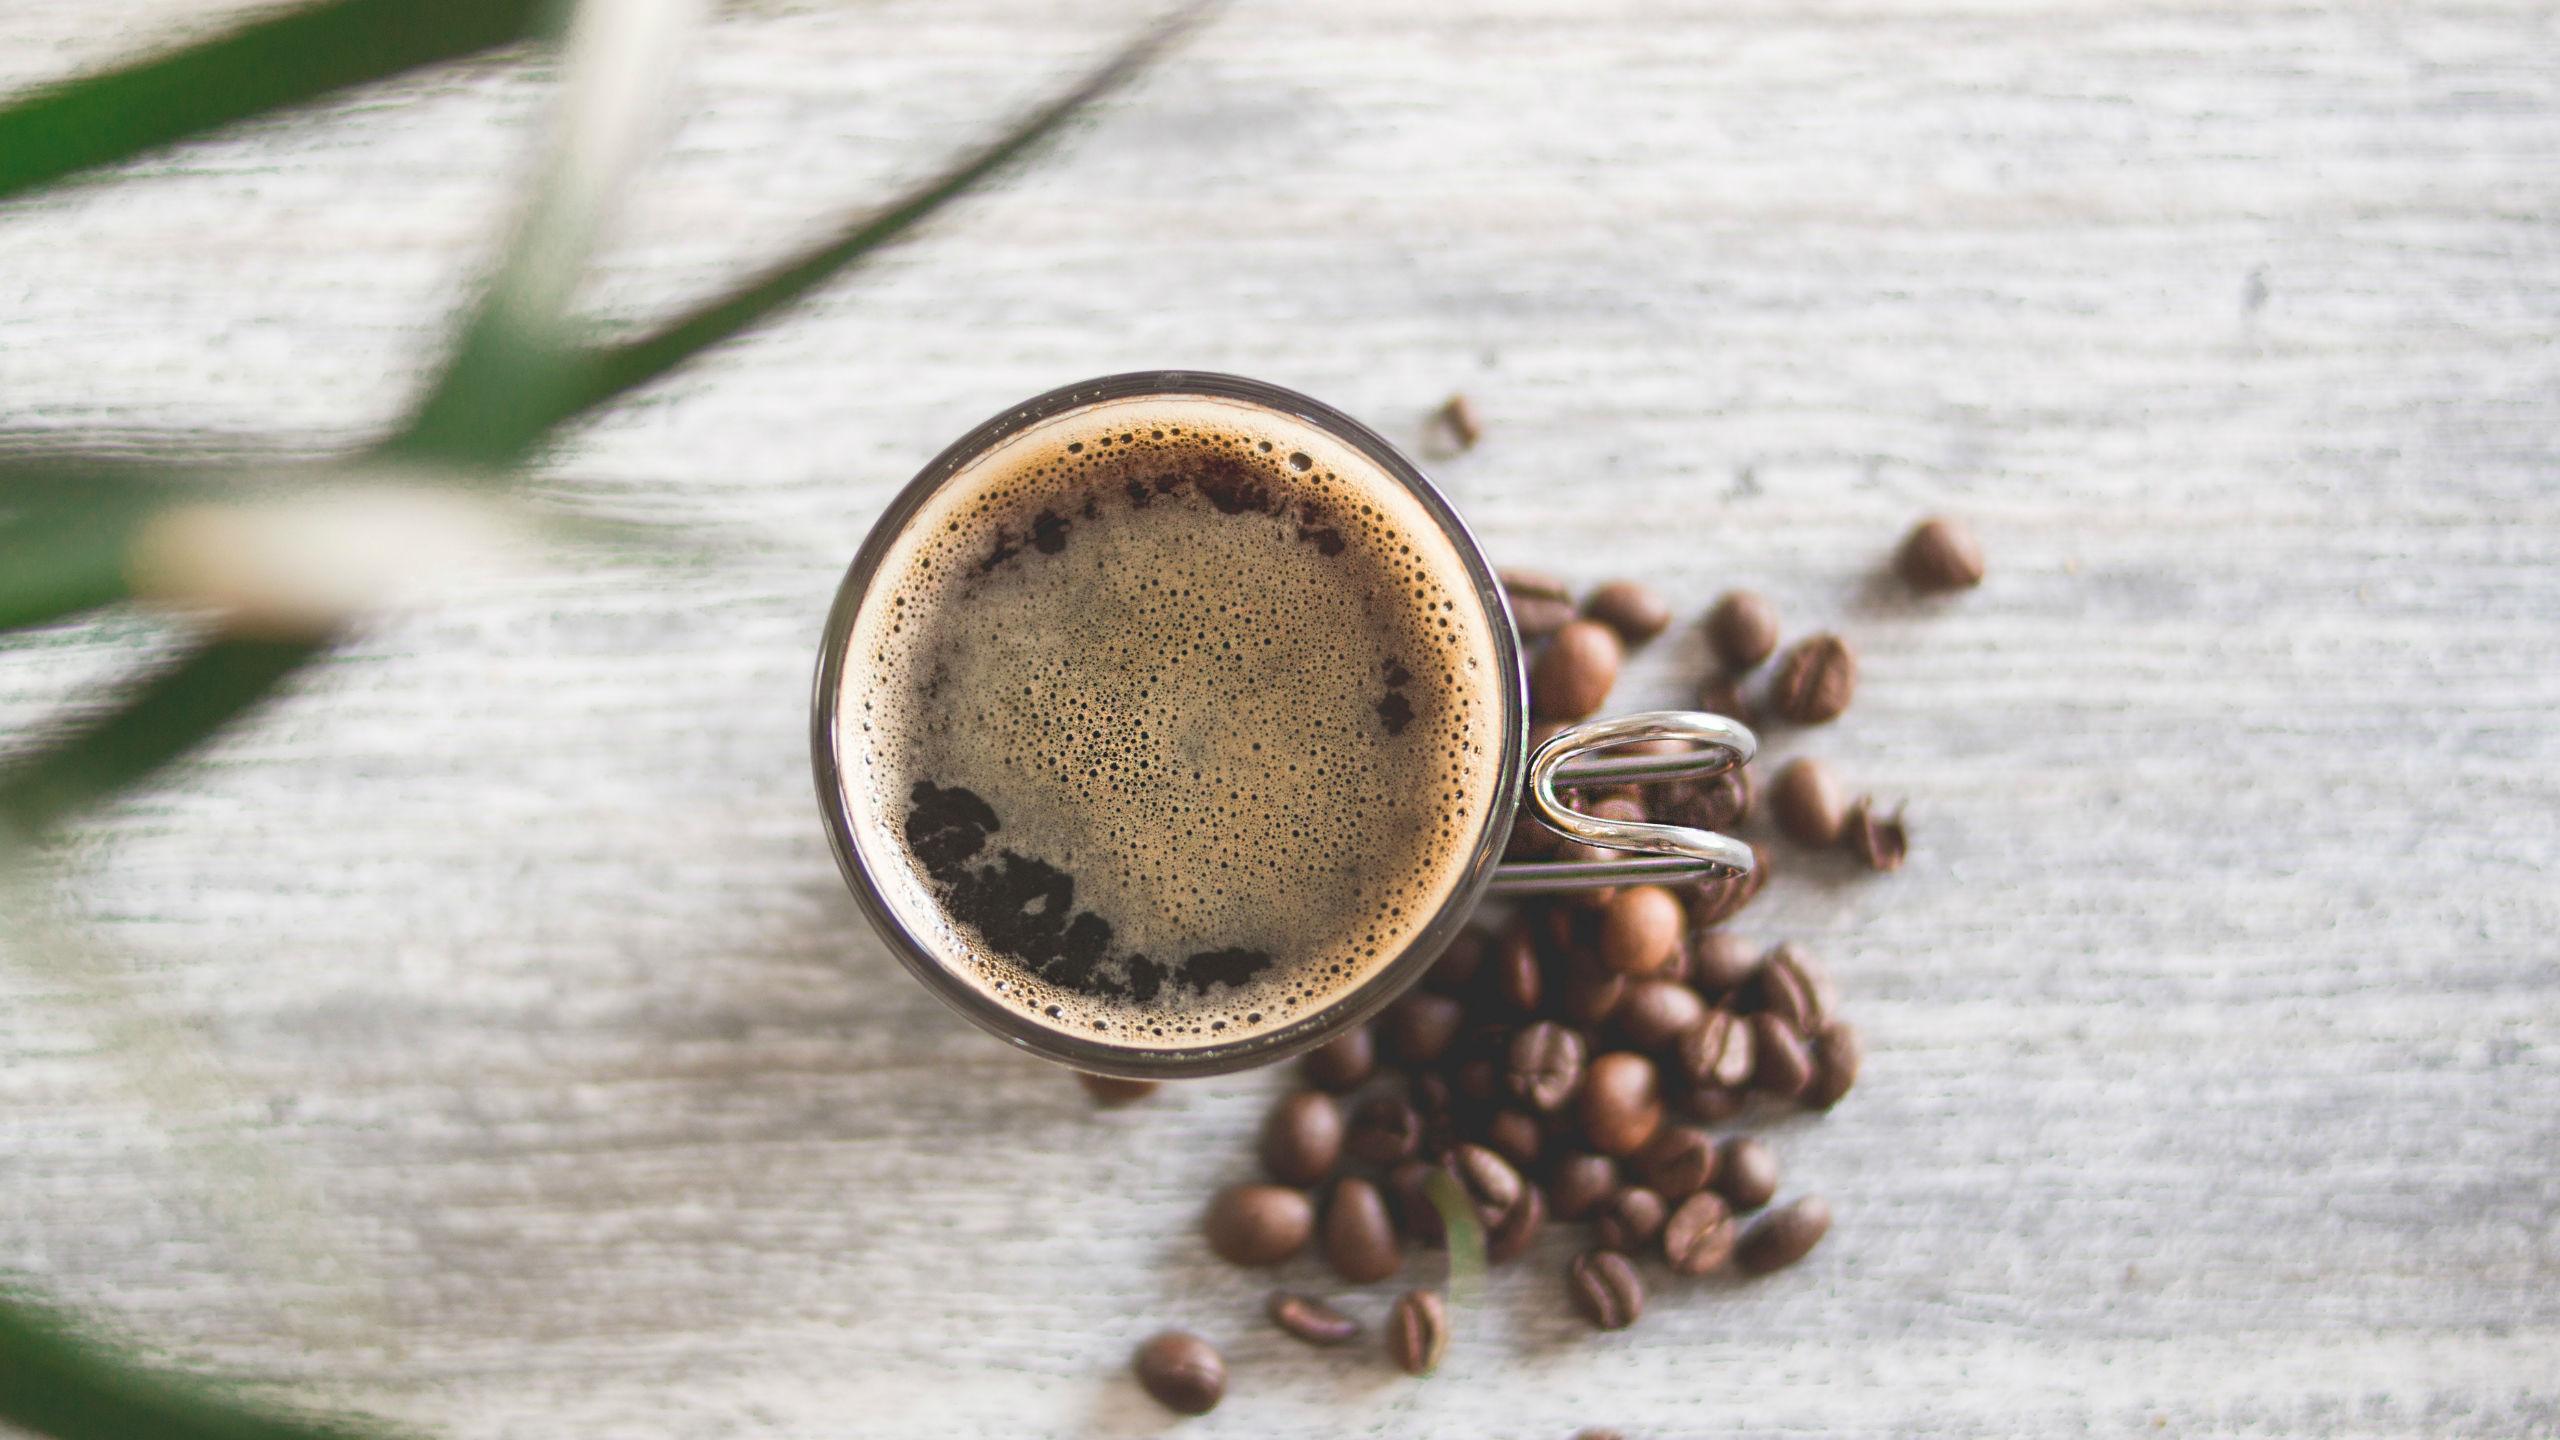 cafe soluble preparado